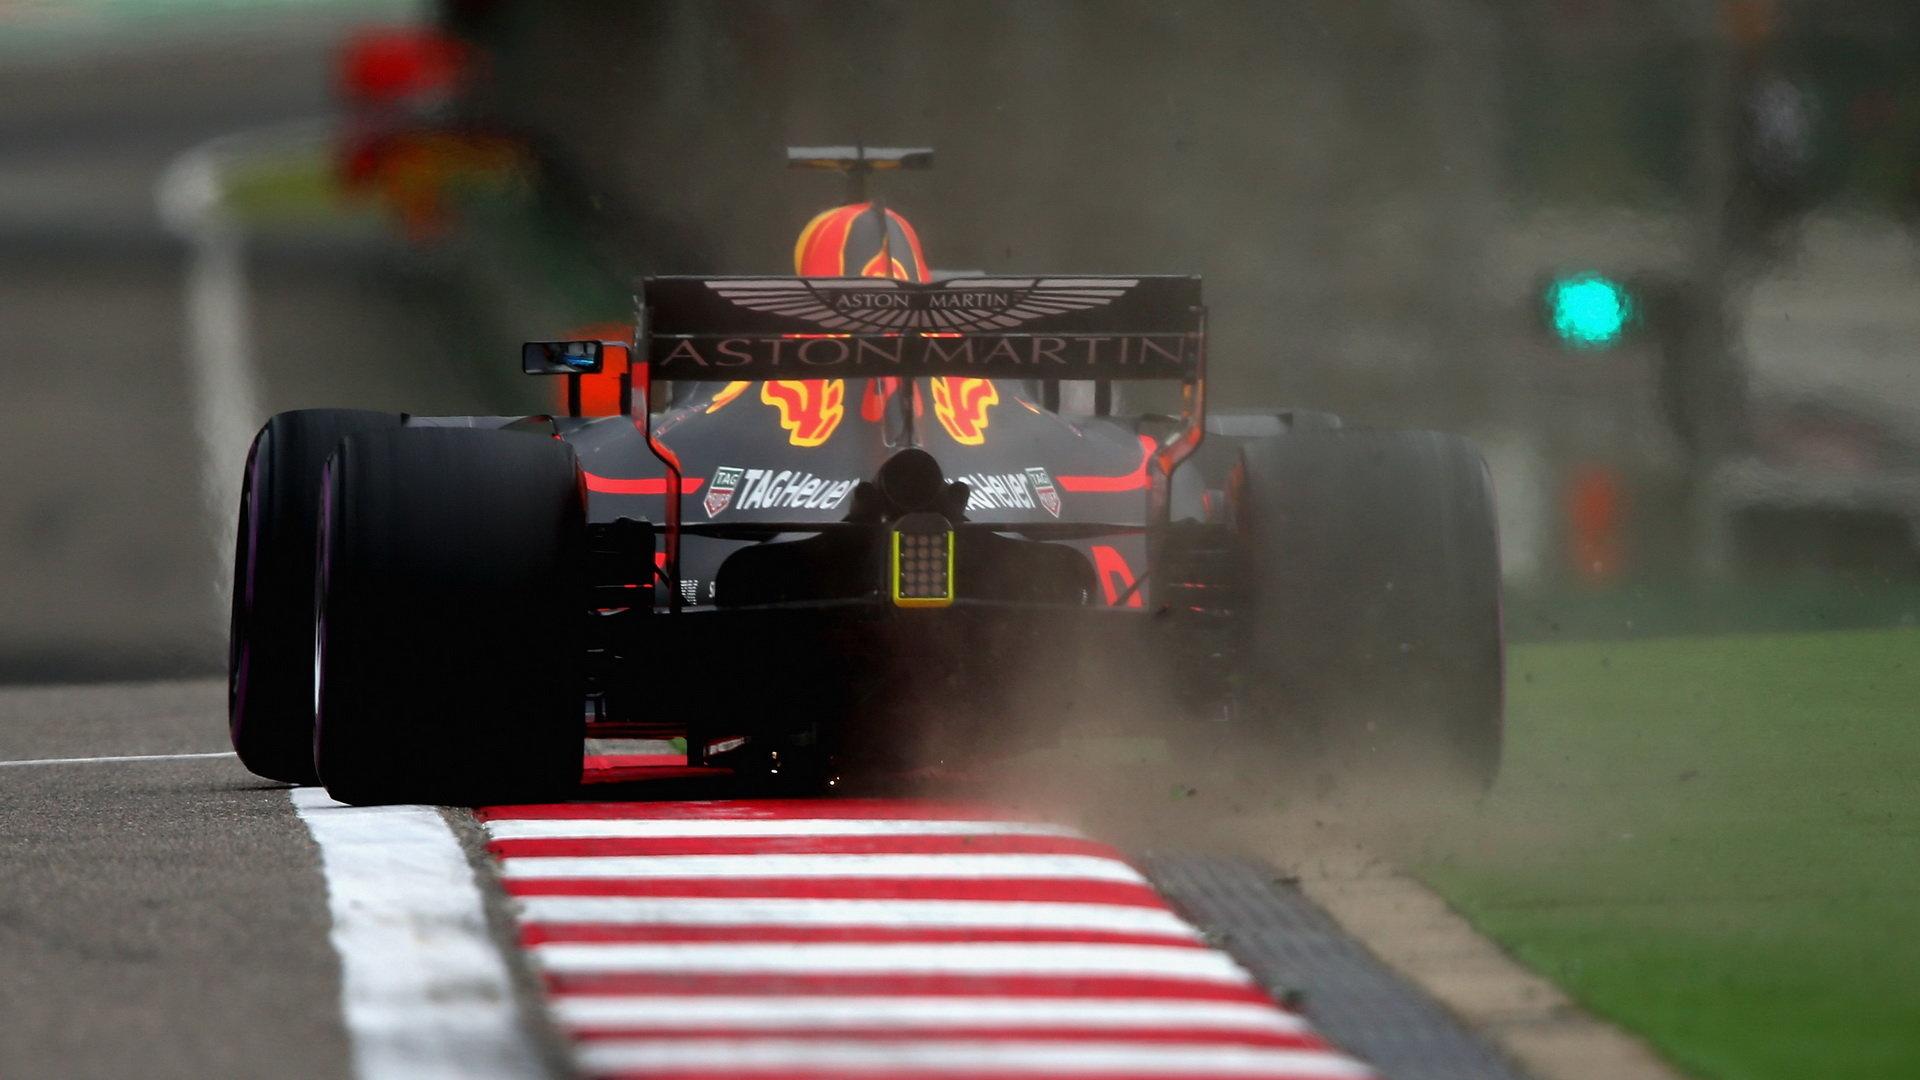 Daniel Ricciardo dokonale využil chyby svého kolegy a vyhrál